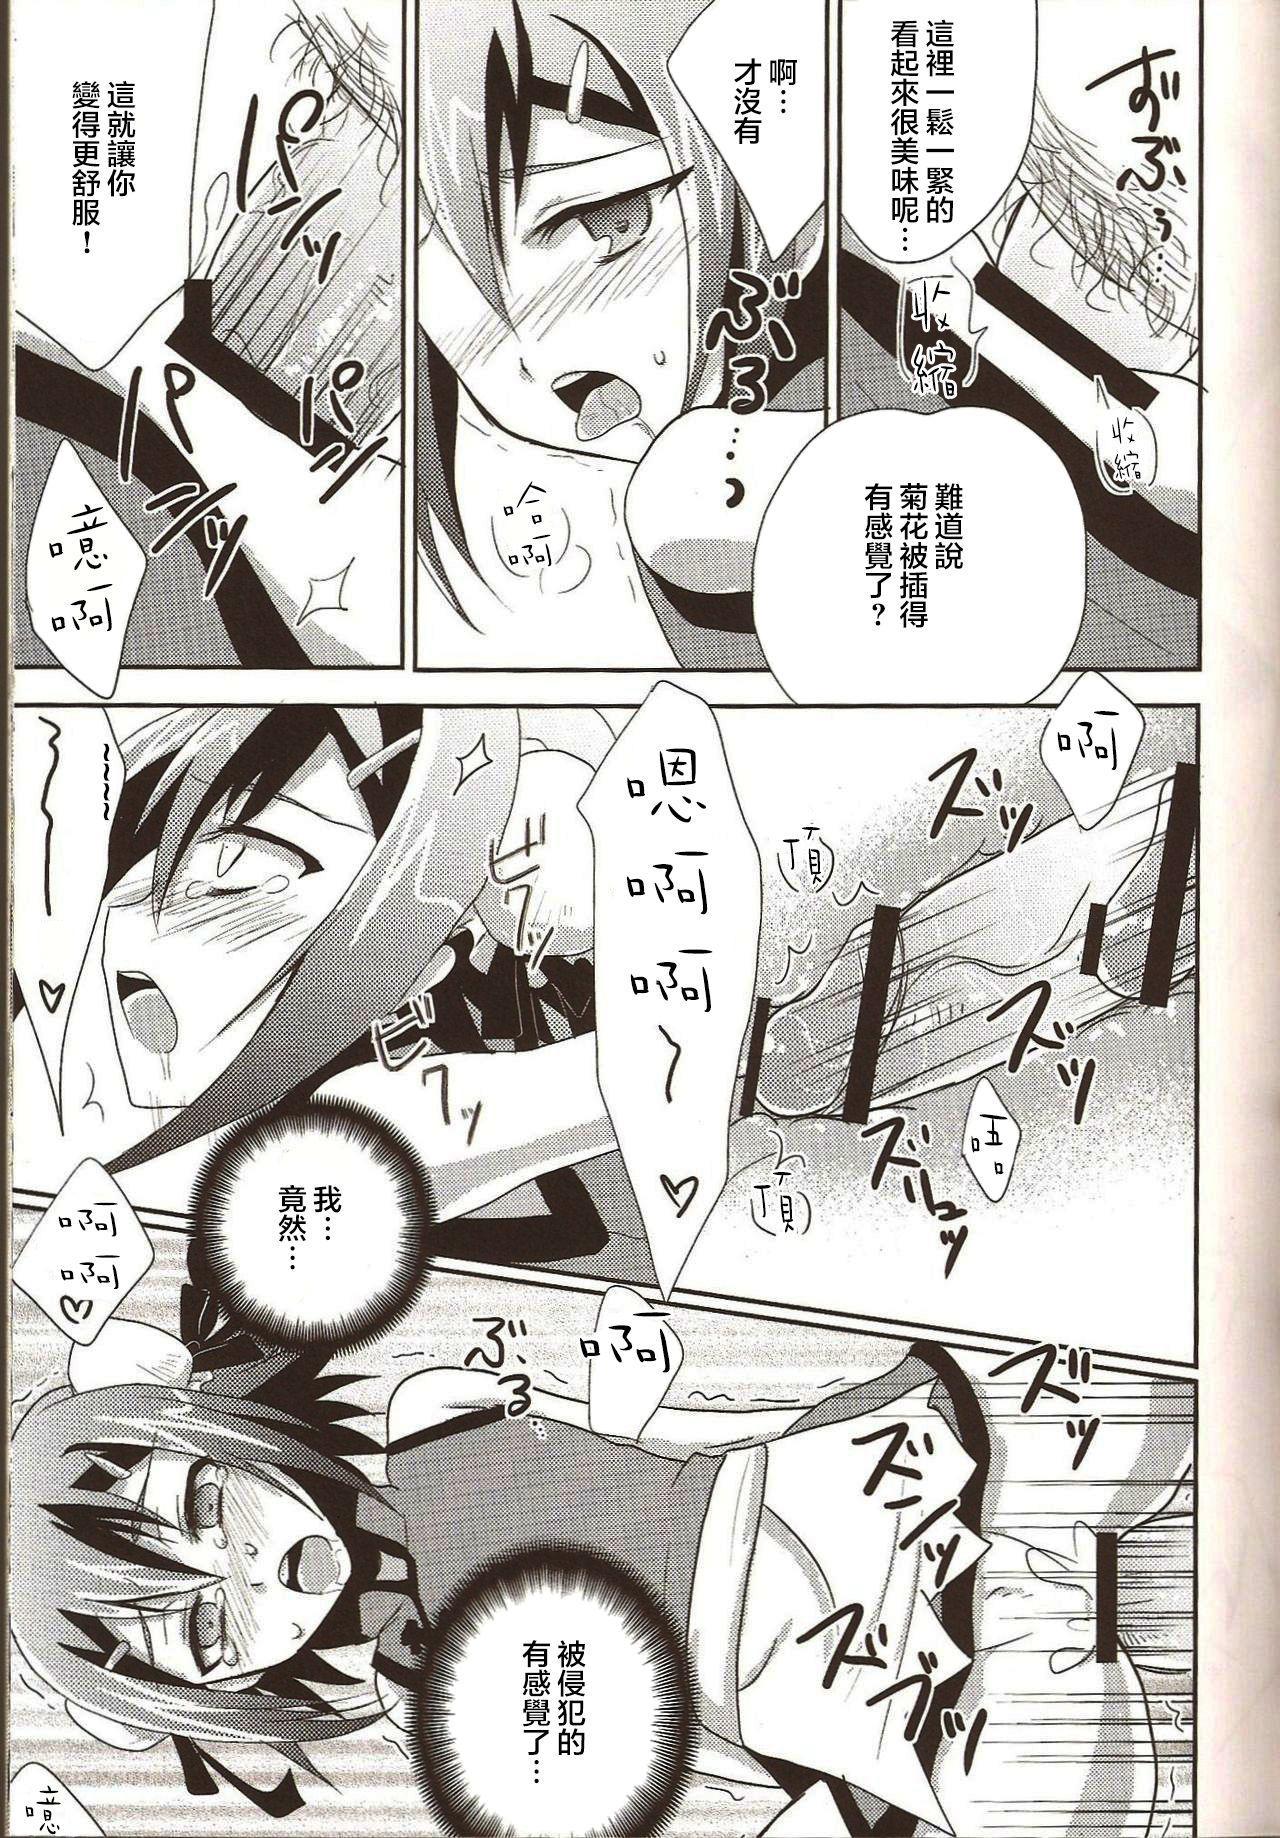 Hideyoshi Director's Cut 10